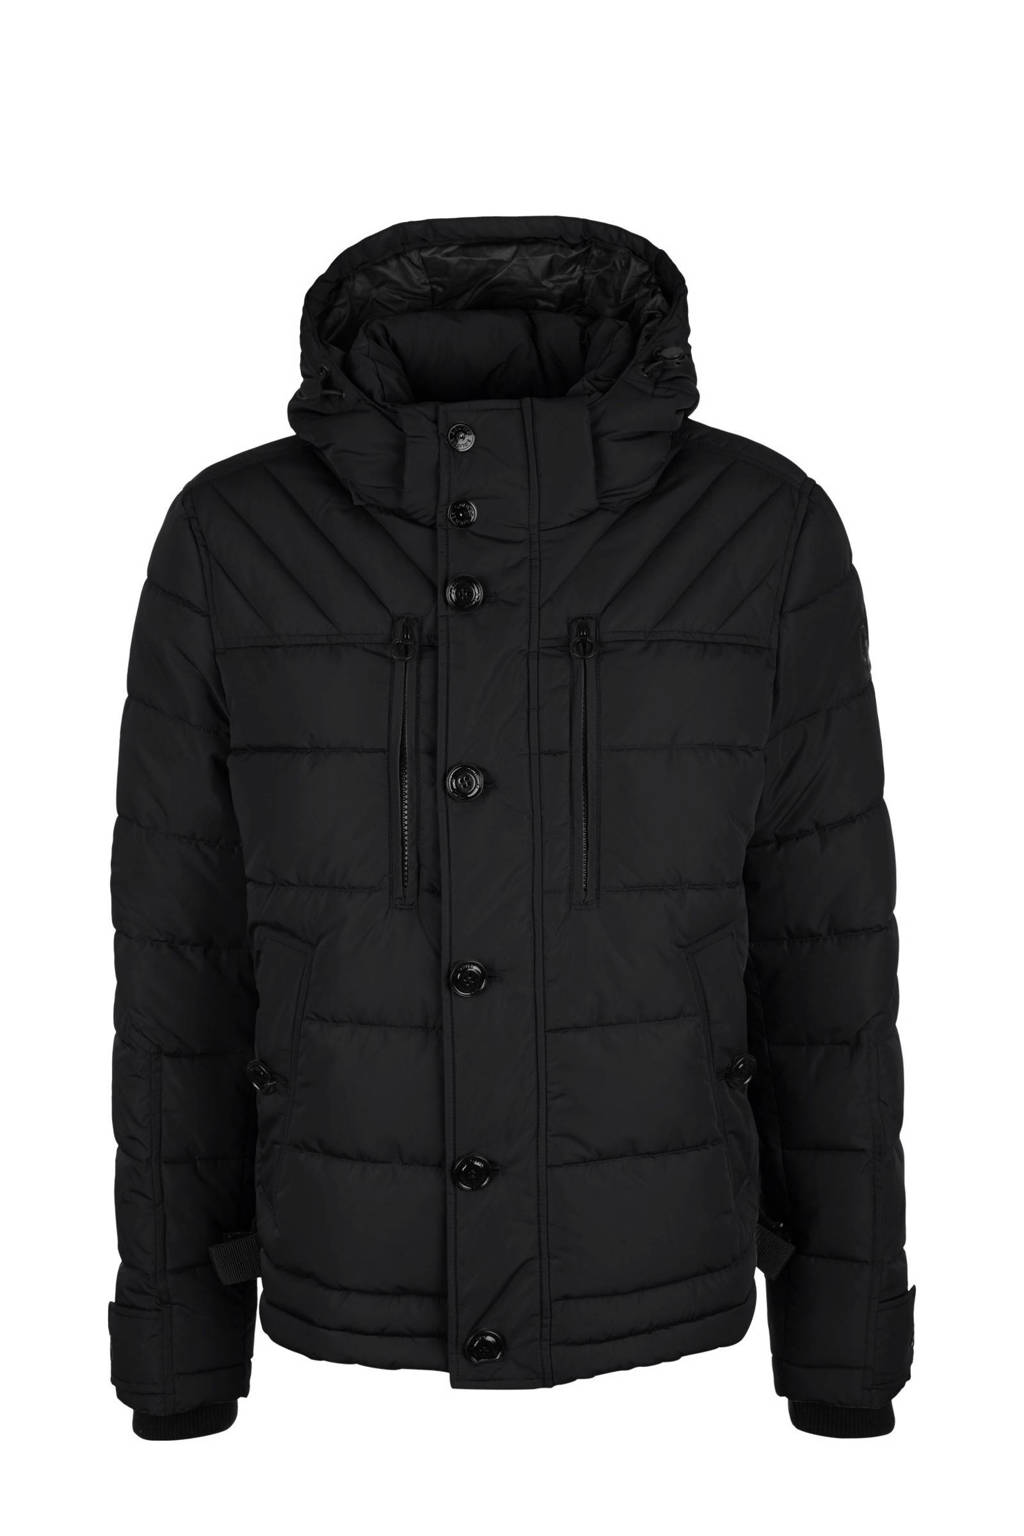 s.Oliver gewatteerde jas zwart, Zwart